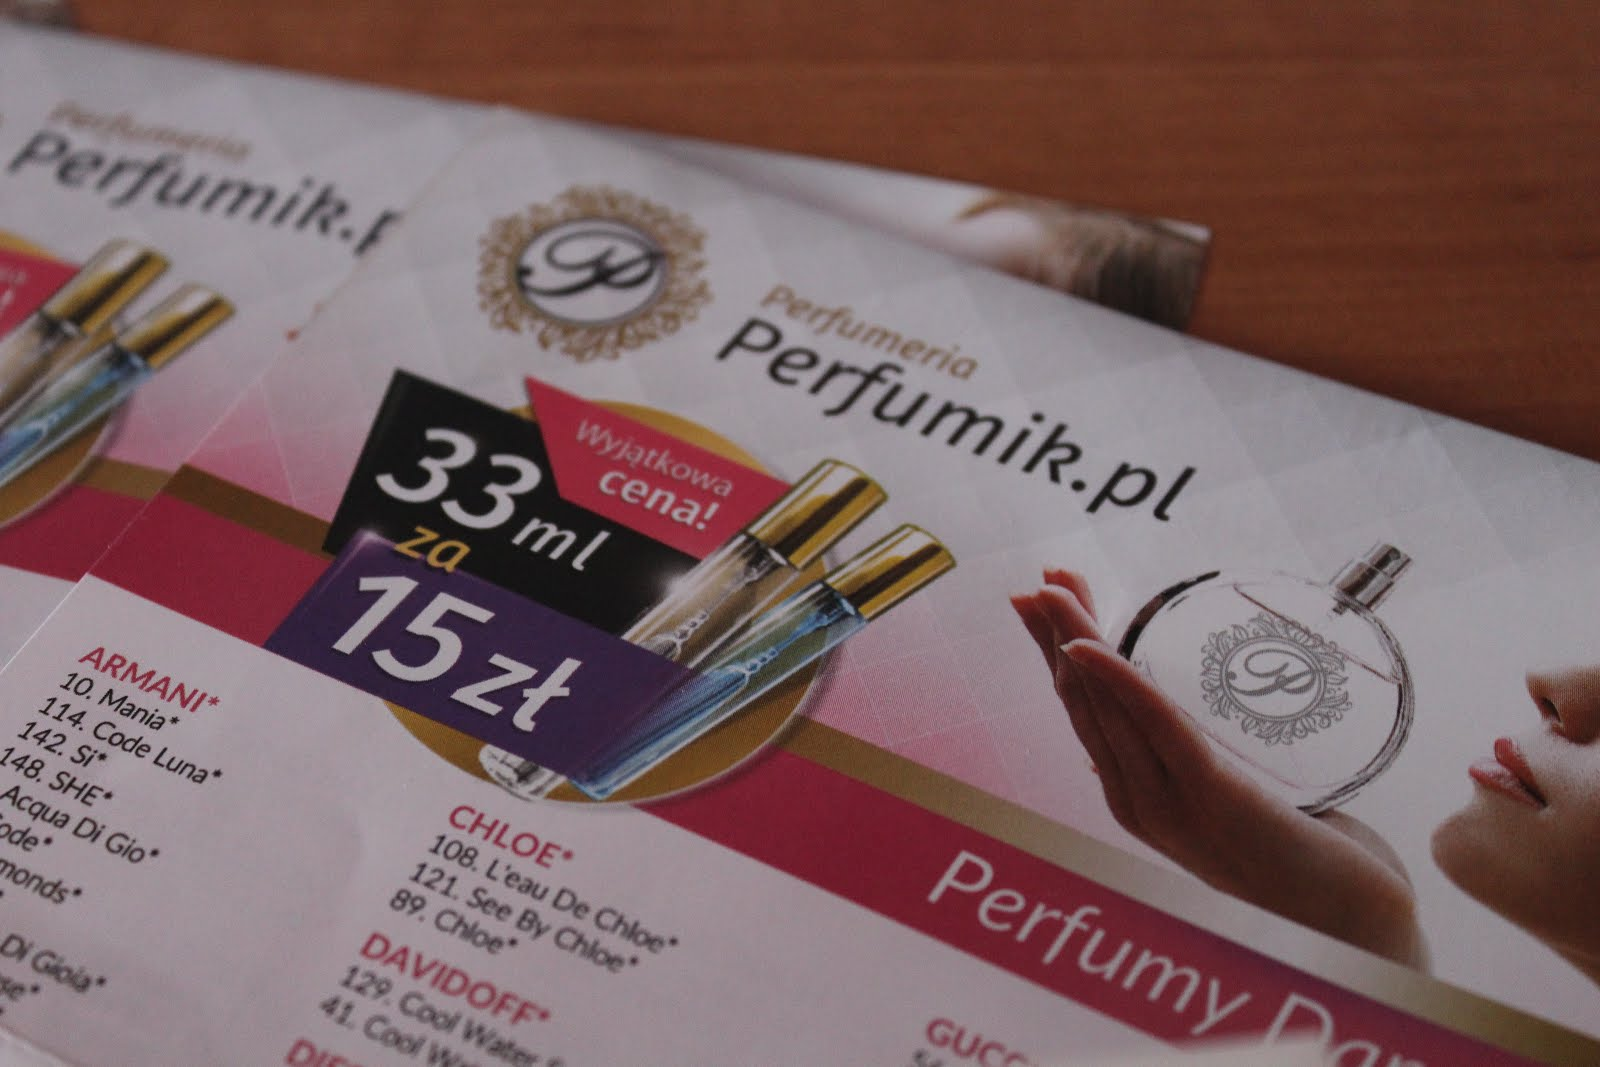 www.perfumik.pl